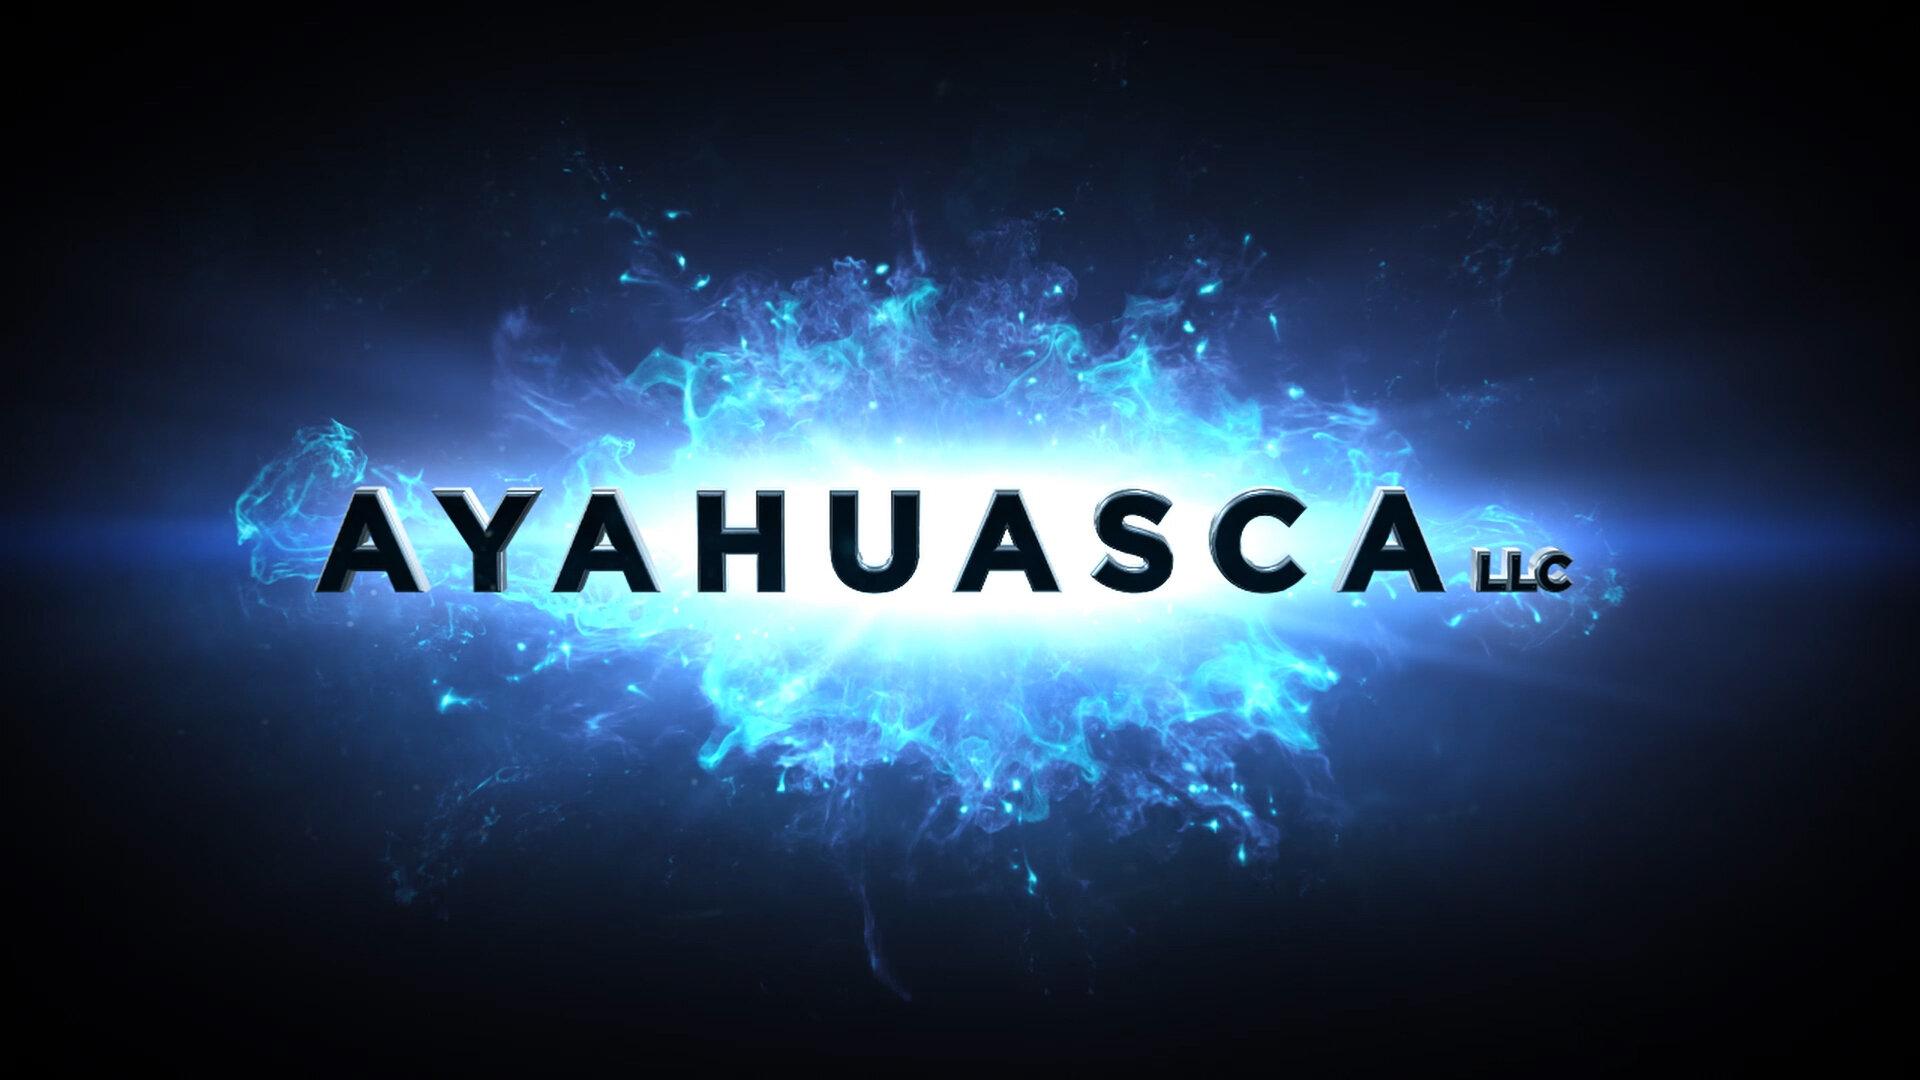 Ayahuasca_LLC_1080 (00621).jpg